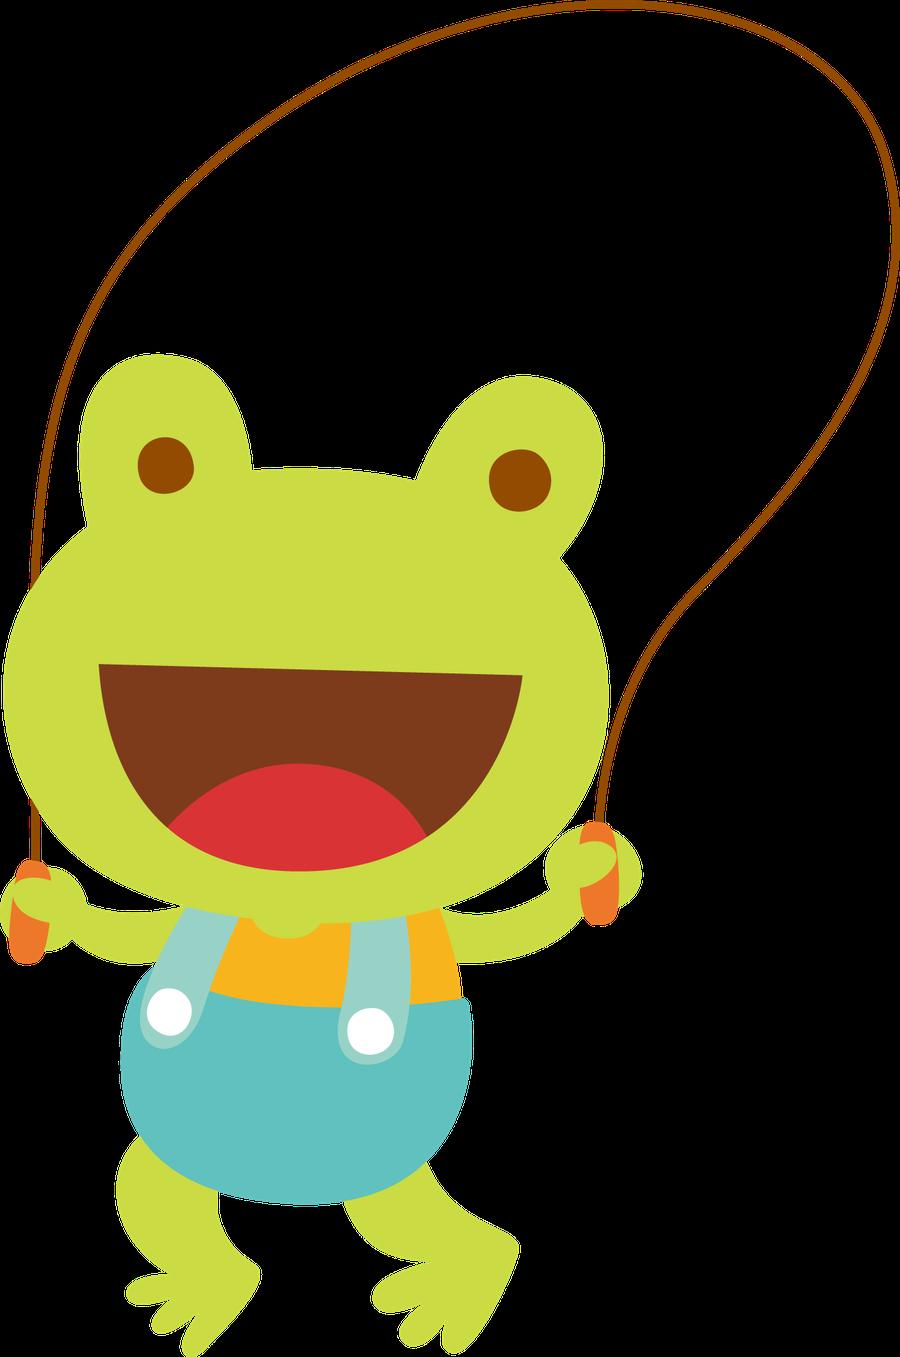 Frogs clipart birthday. Sapos minus already felt